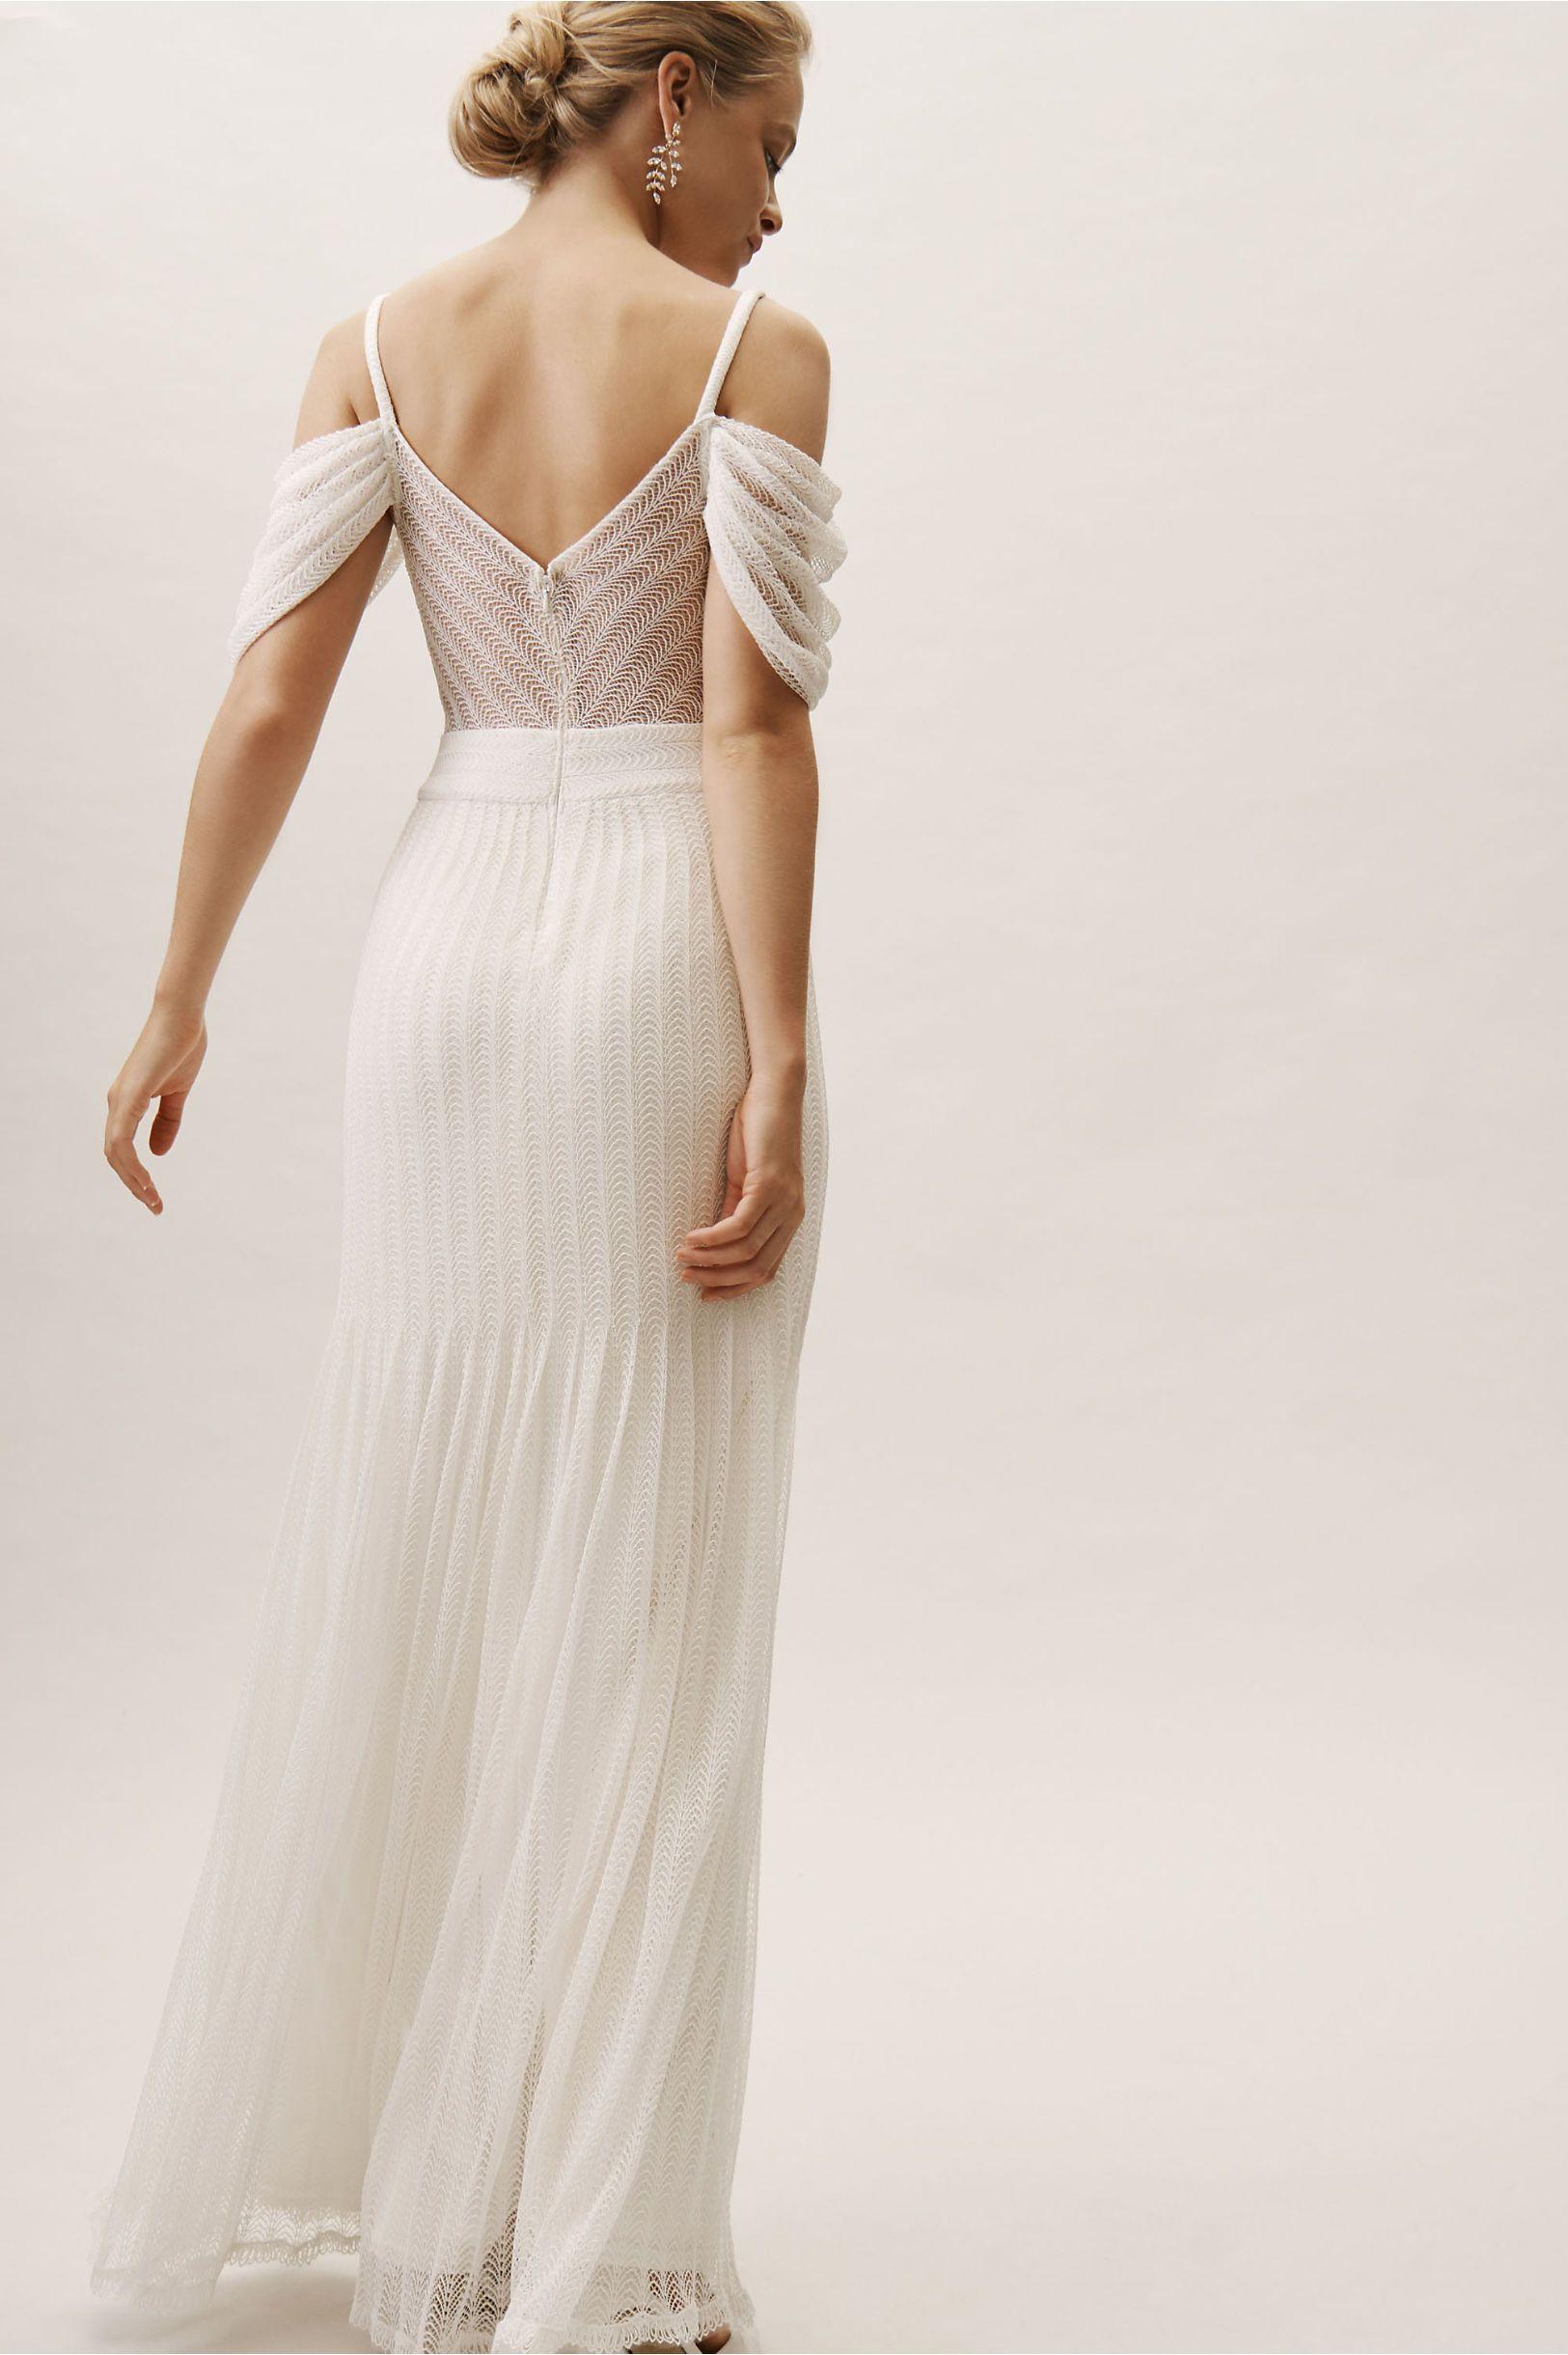 Rae Gown Bhldn Wedding Dress Wedding Dresses Backless Wedding Dress